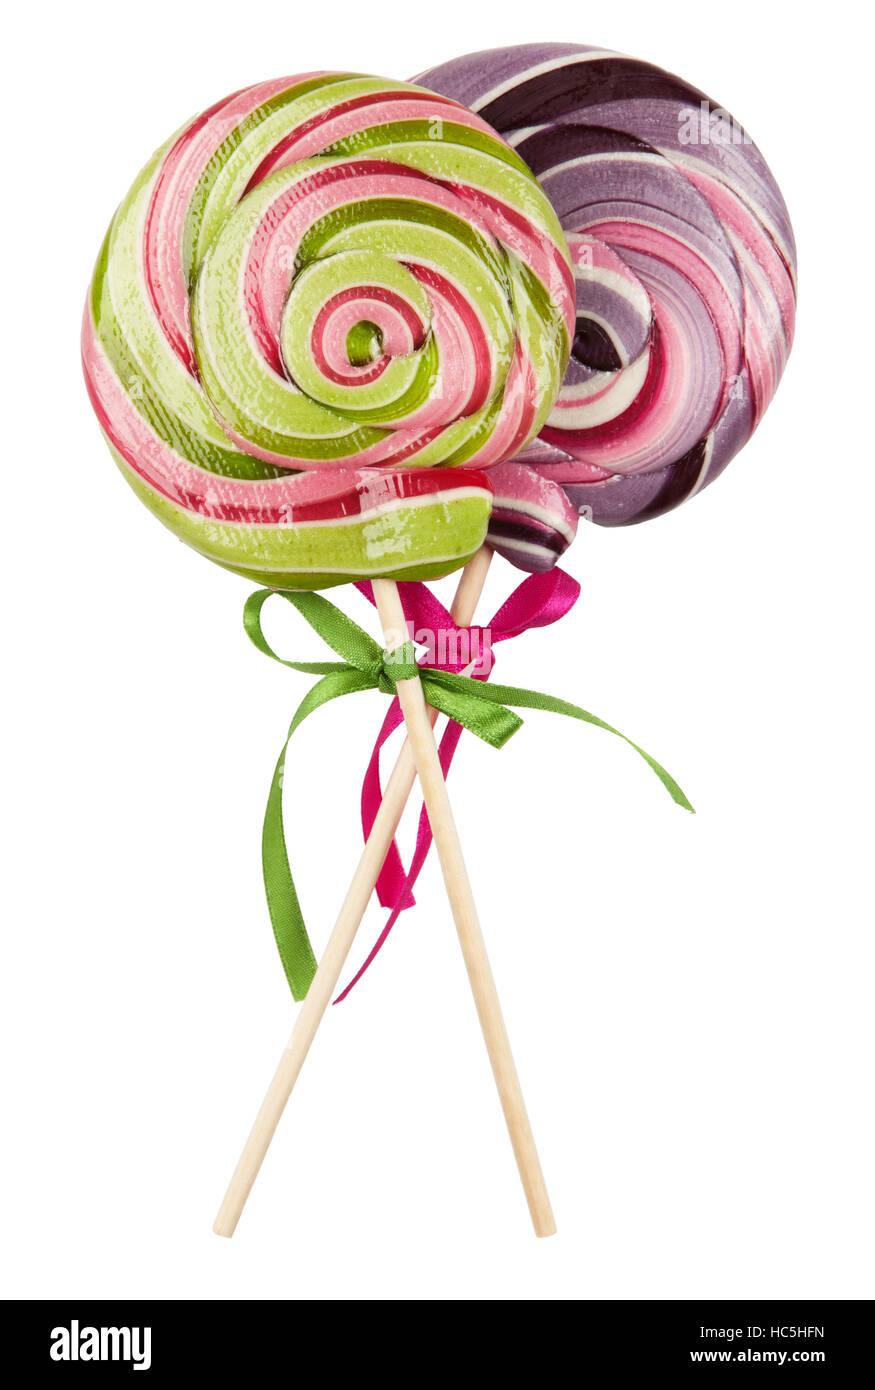 Lollipop on white - Stock Image